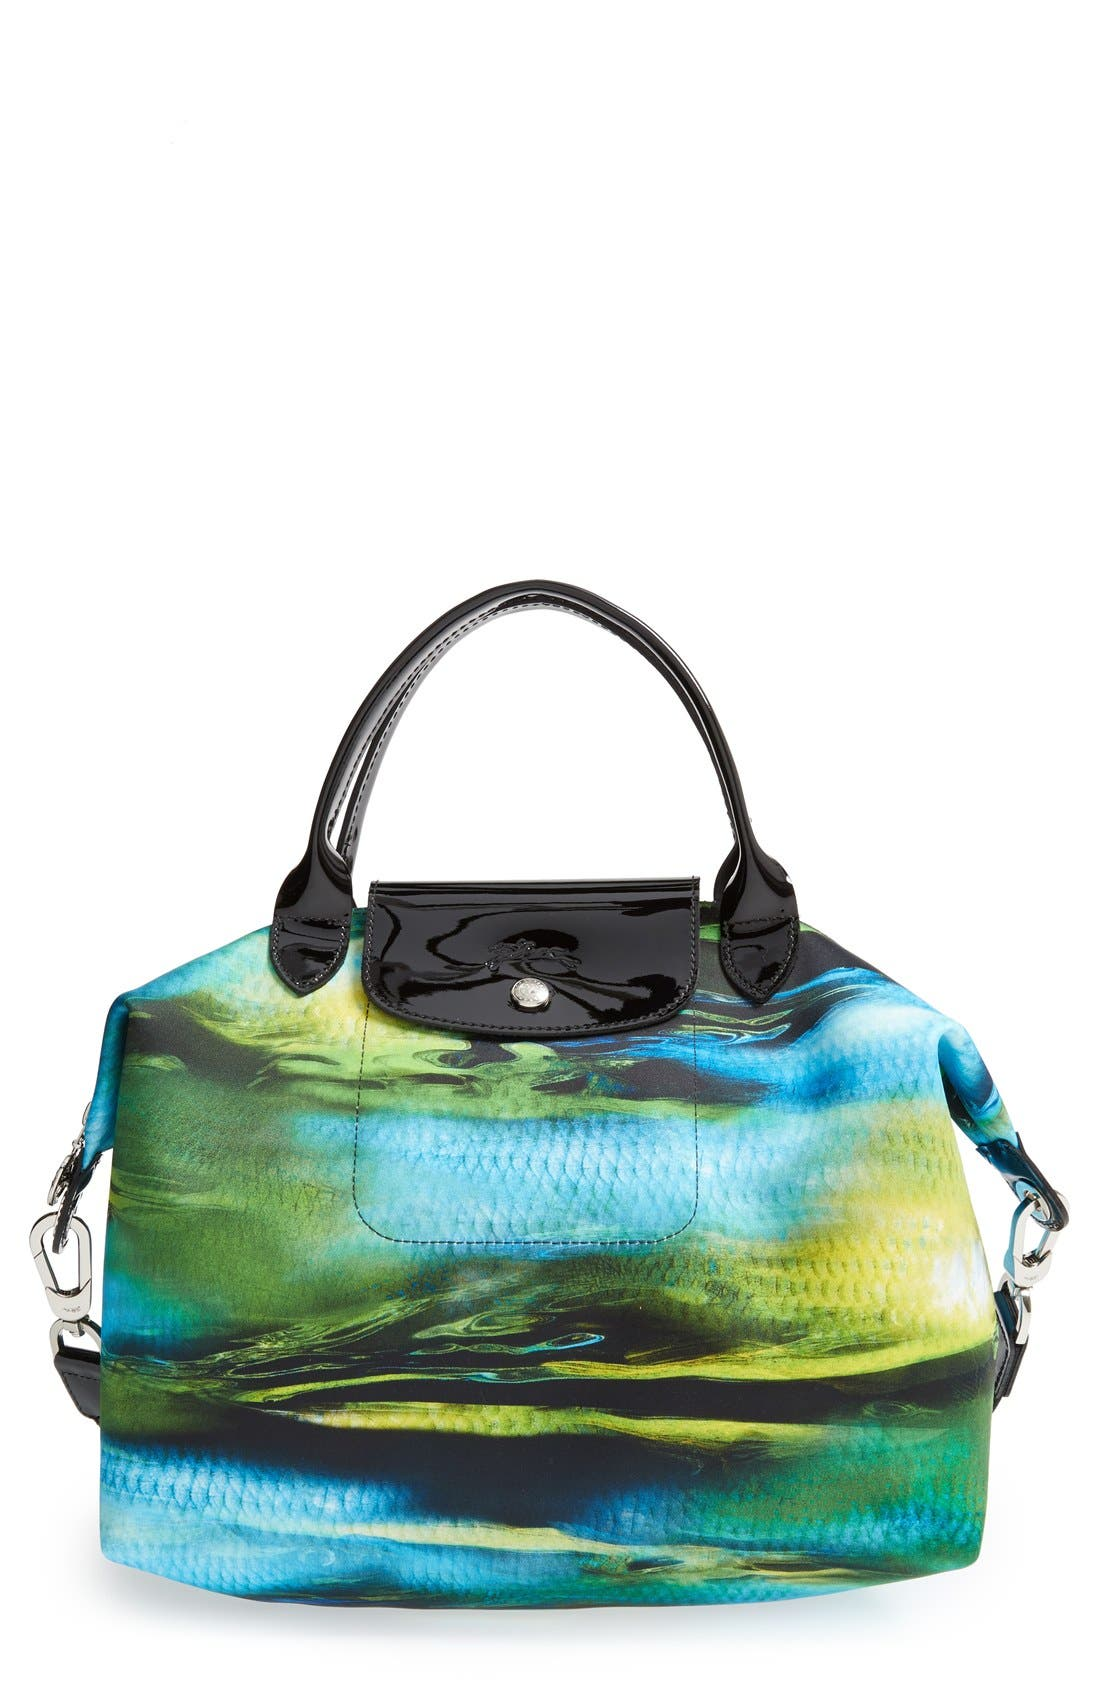 Alternate Image 1 Selected - Longchamp 'Le Pliage - Neo Fantaisie' Top Handle Bag